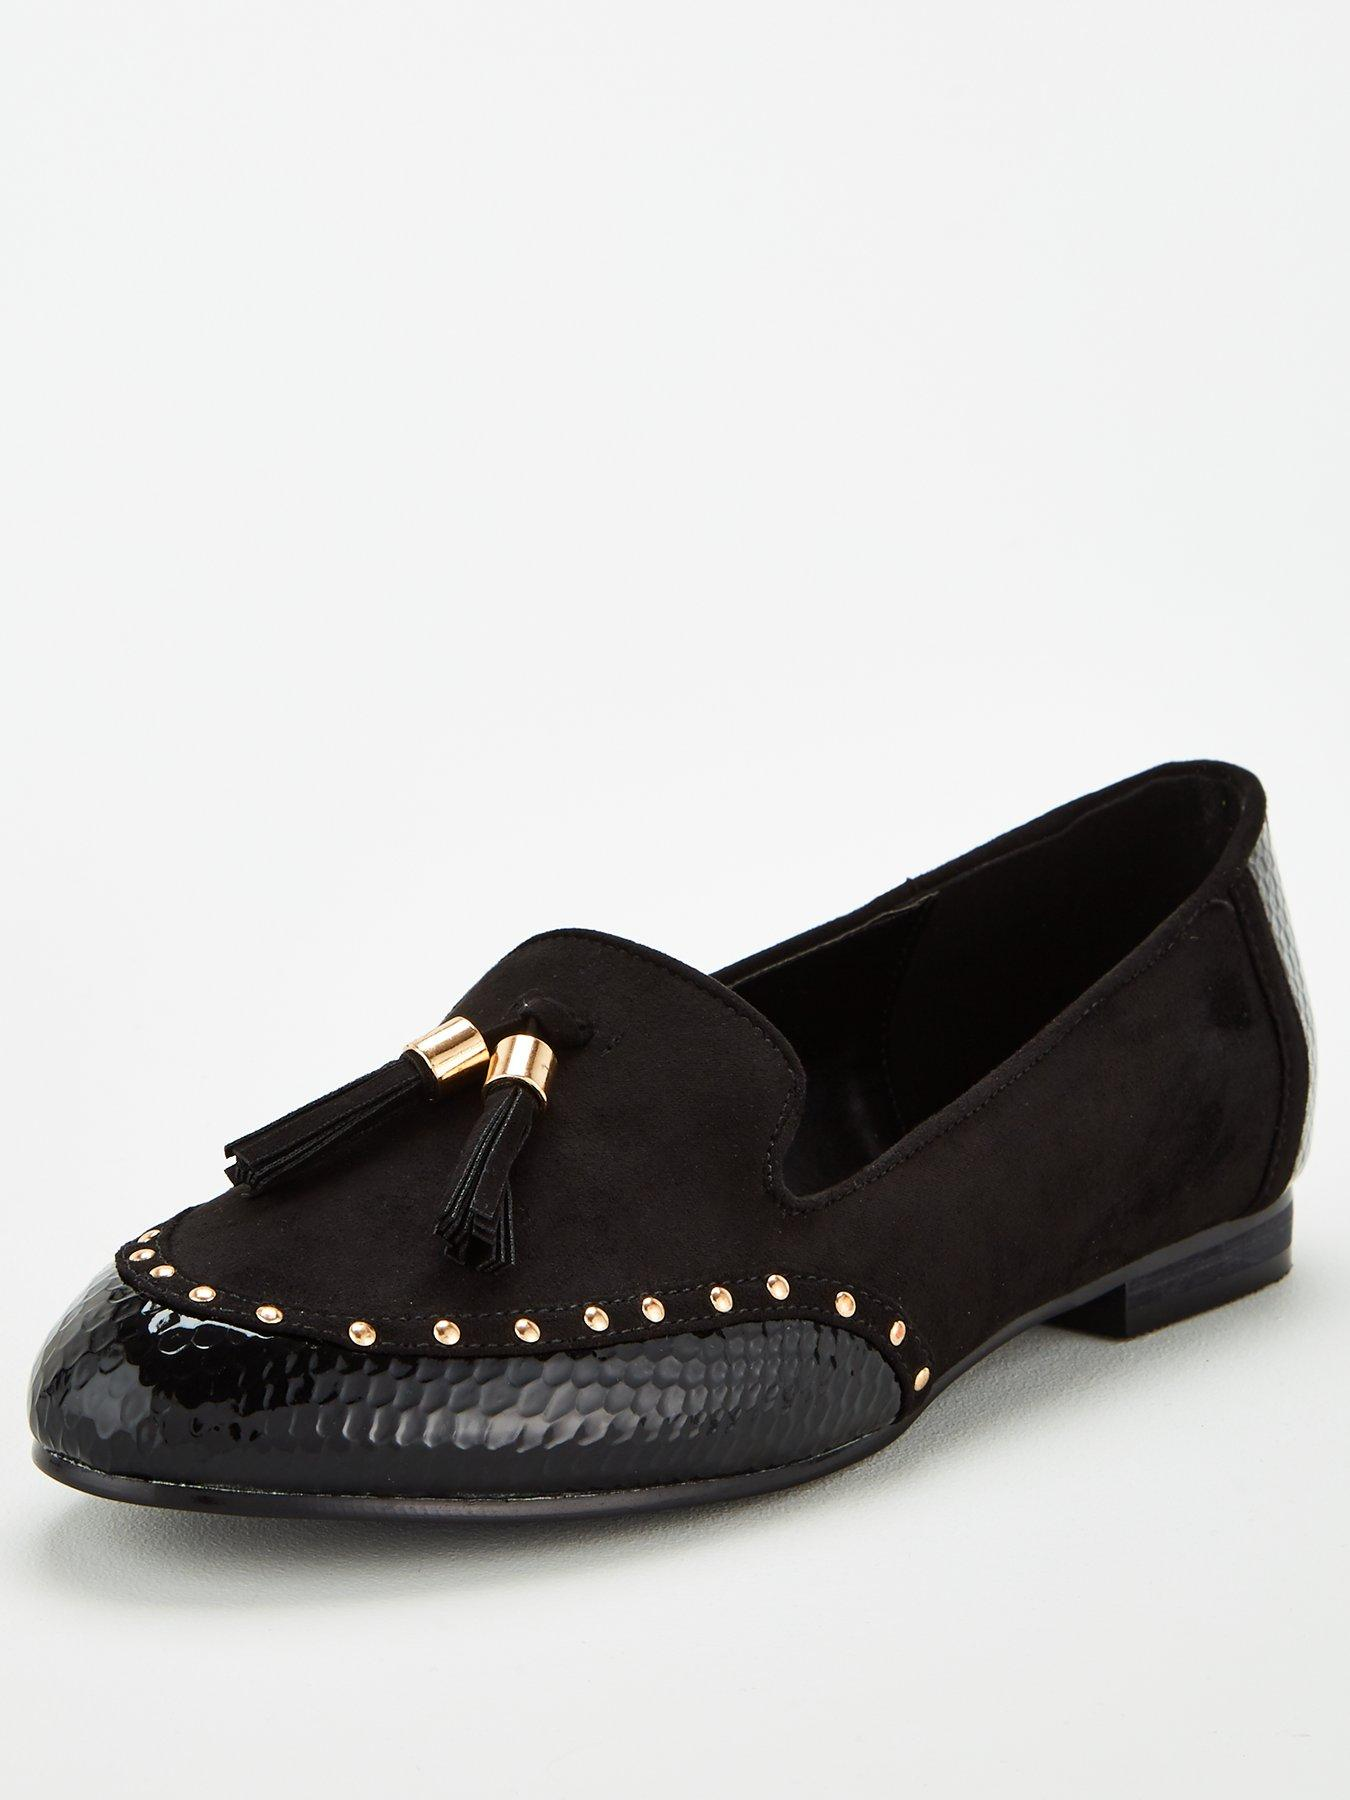 Flat Shoes   Wide   Flats   Shoes